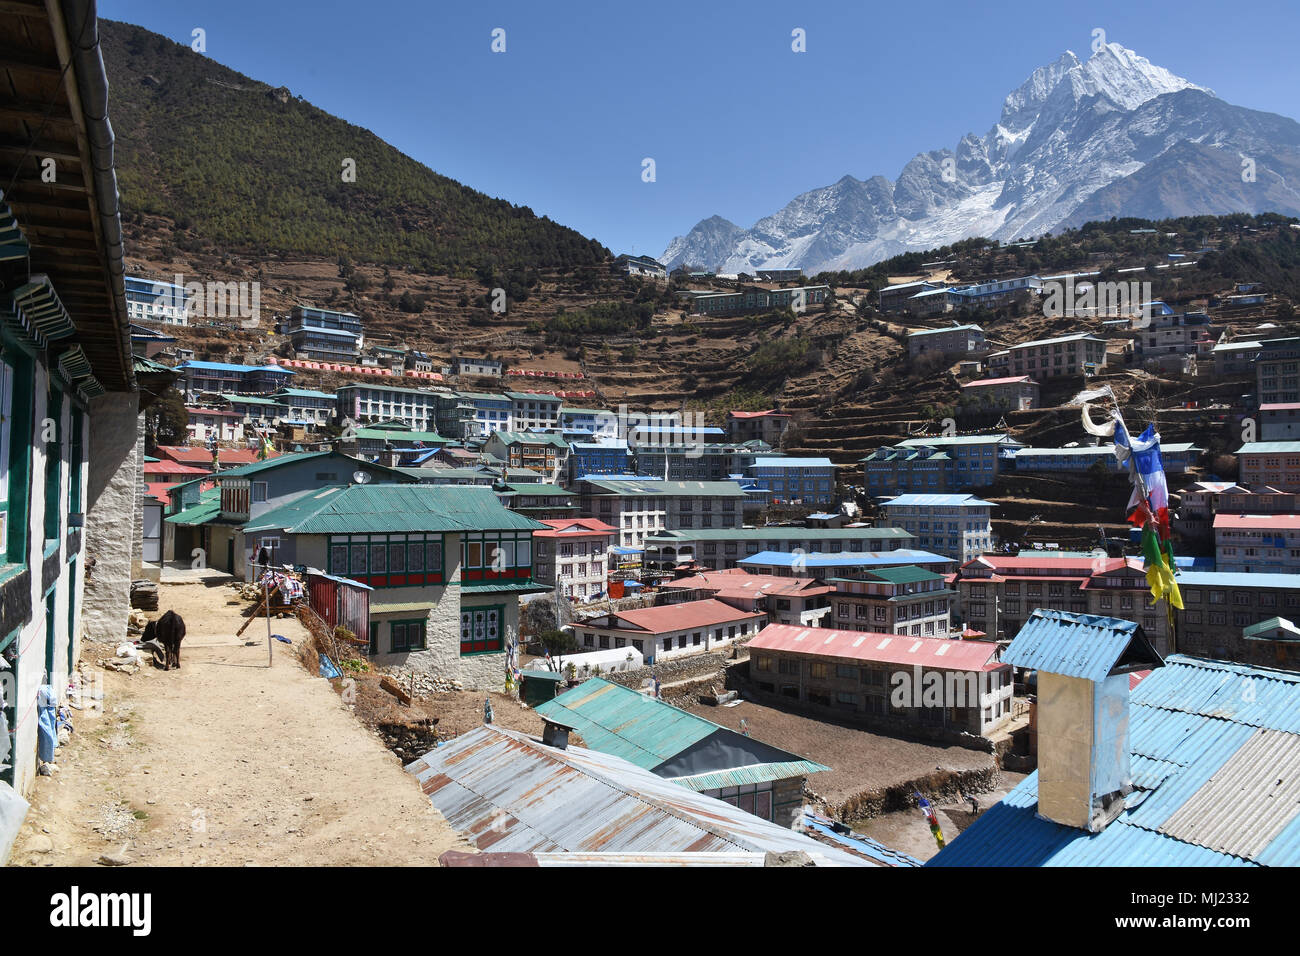 View of Thamserku from Namche Bazaar village, Nepal - Stock Image